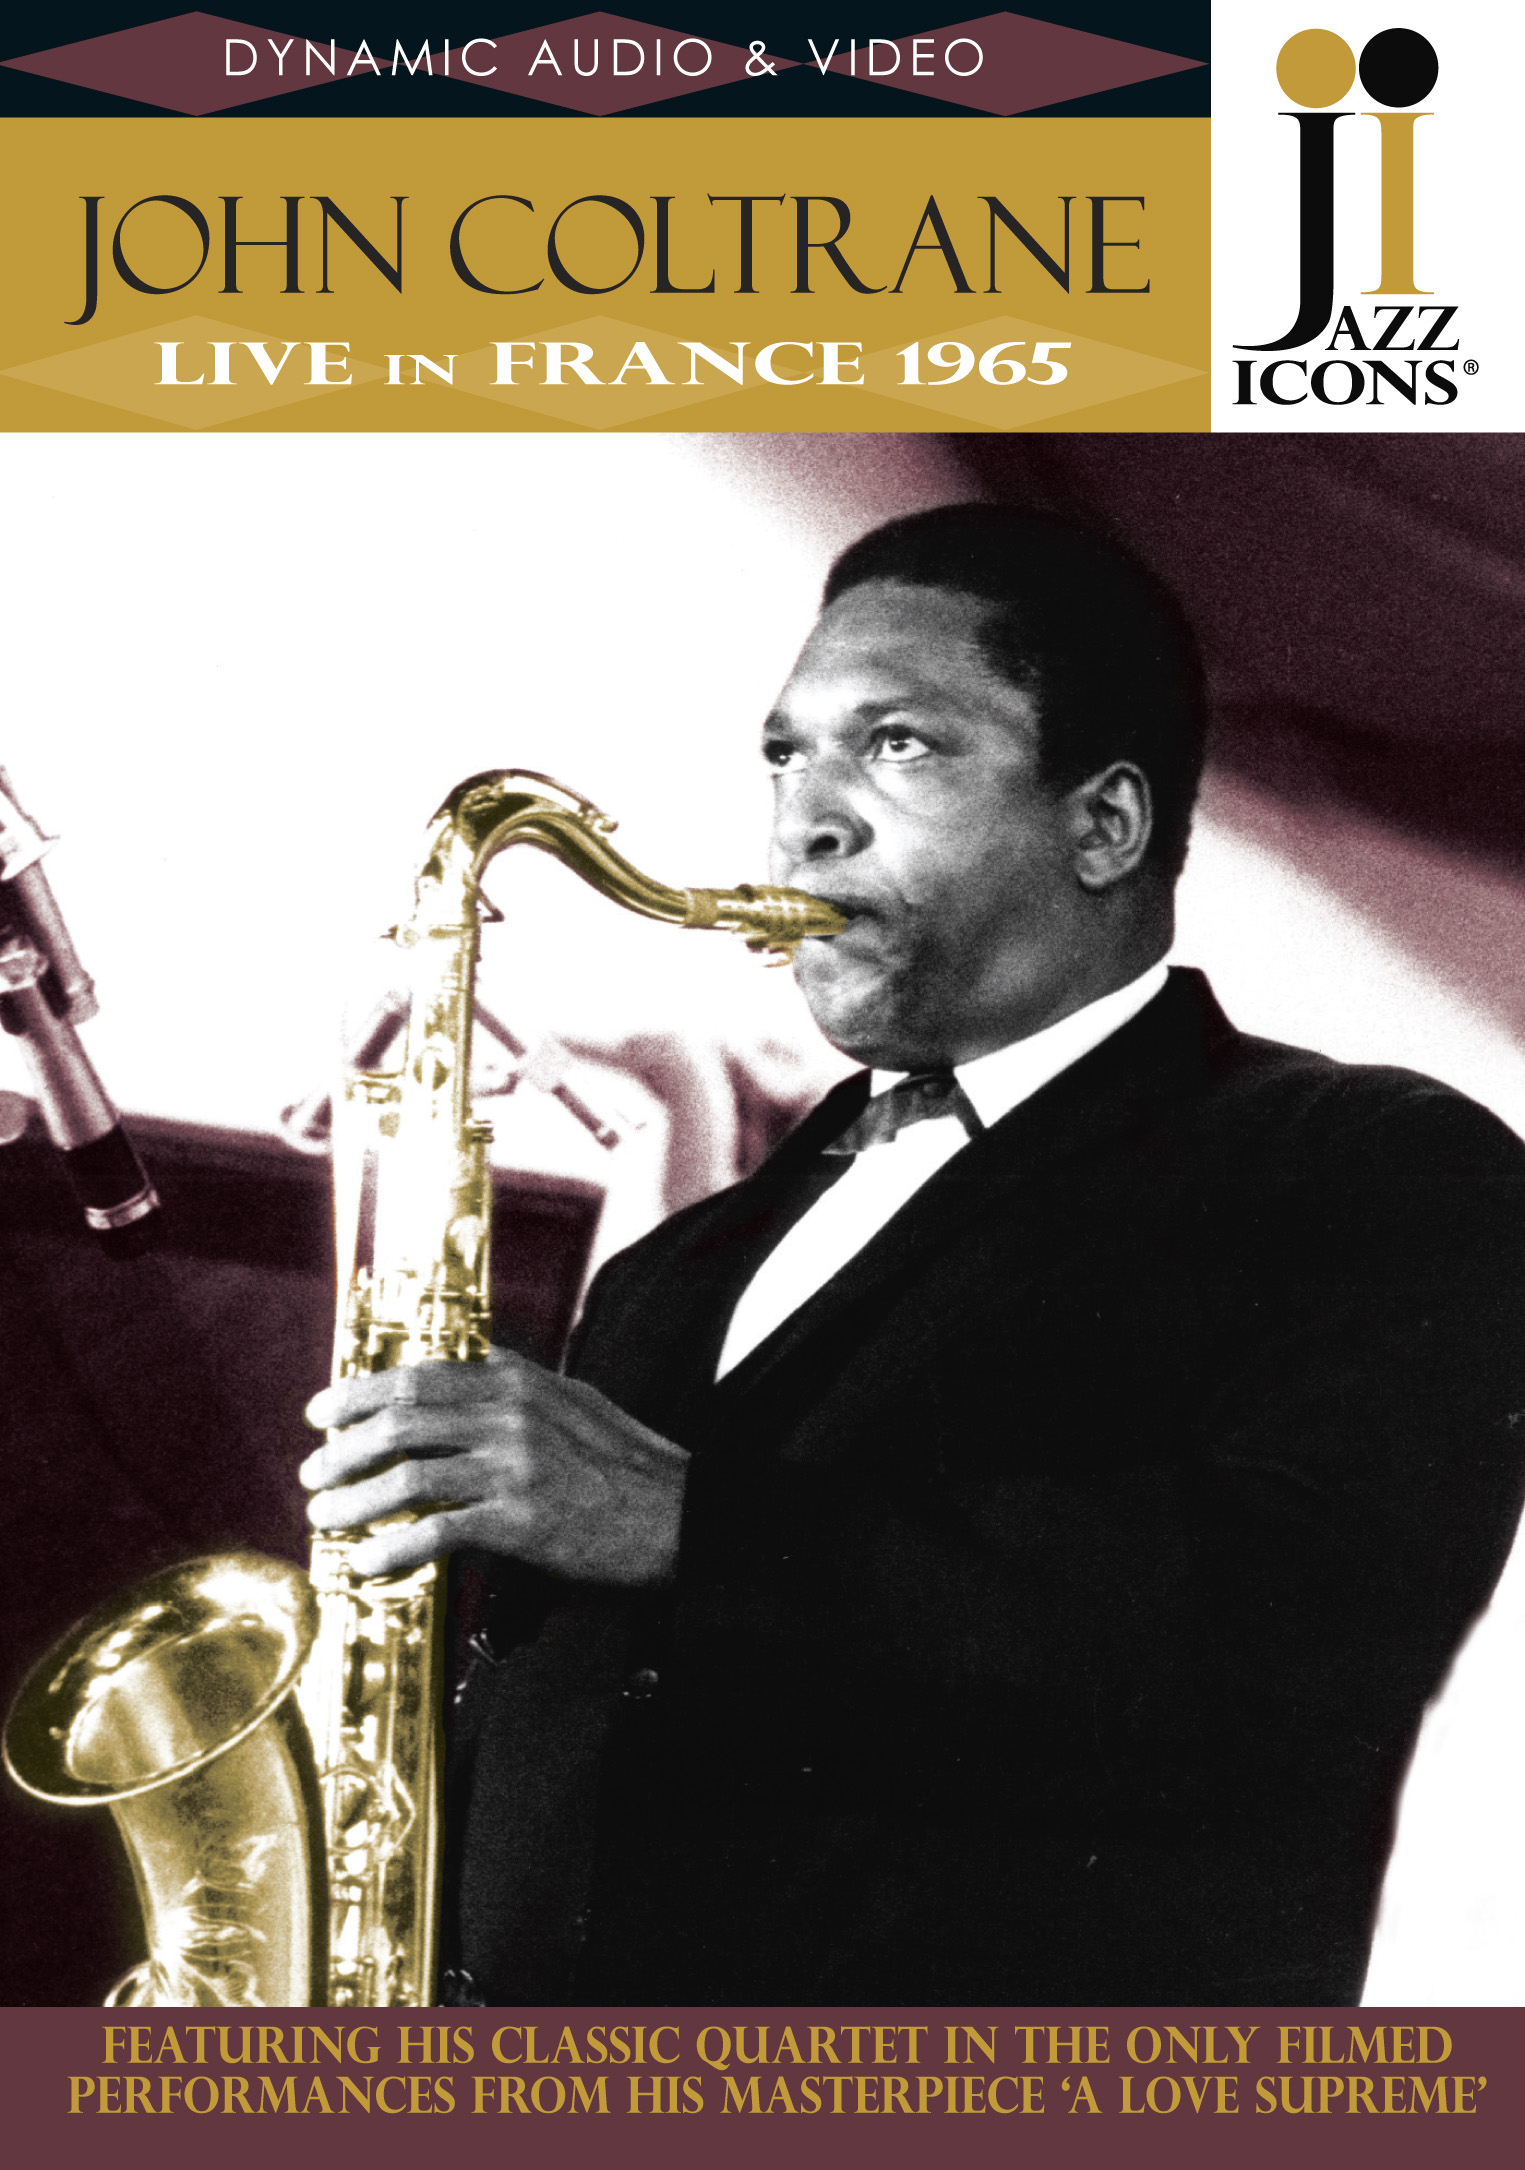 Jazz Icons: John Coltrane - Live in France 1965